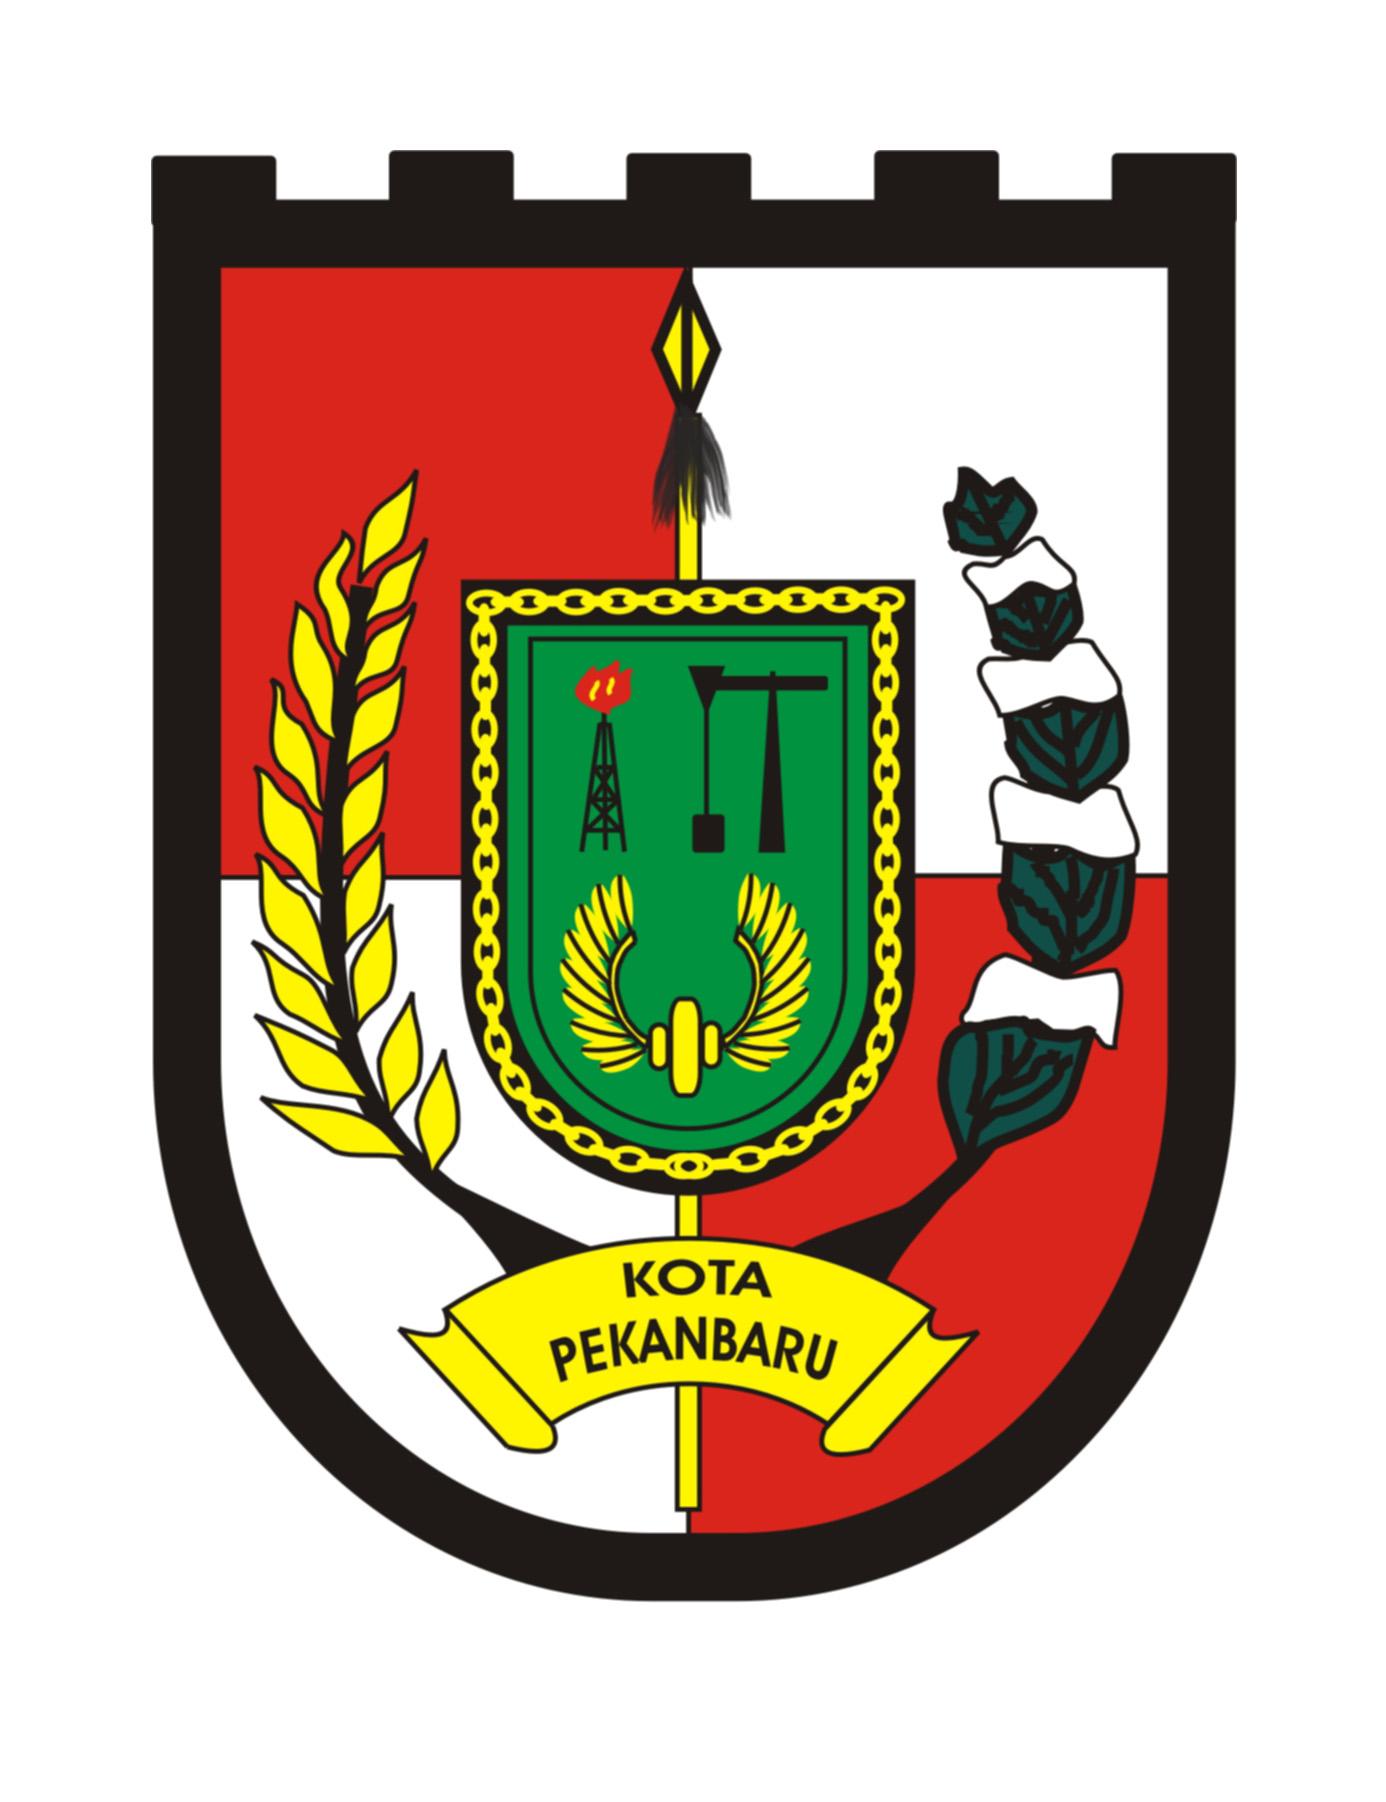 Logo Kota Pekanbaru (Provinsi Riau, Indonesia) Original